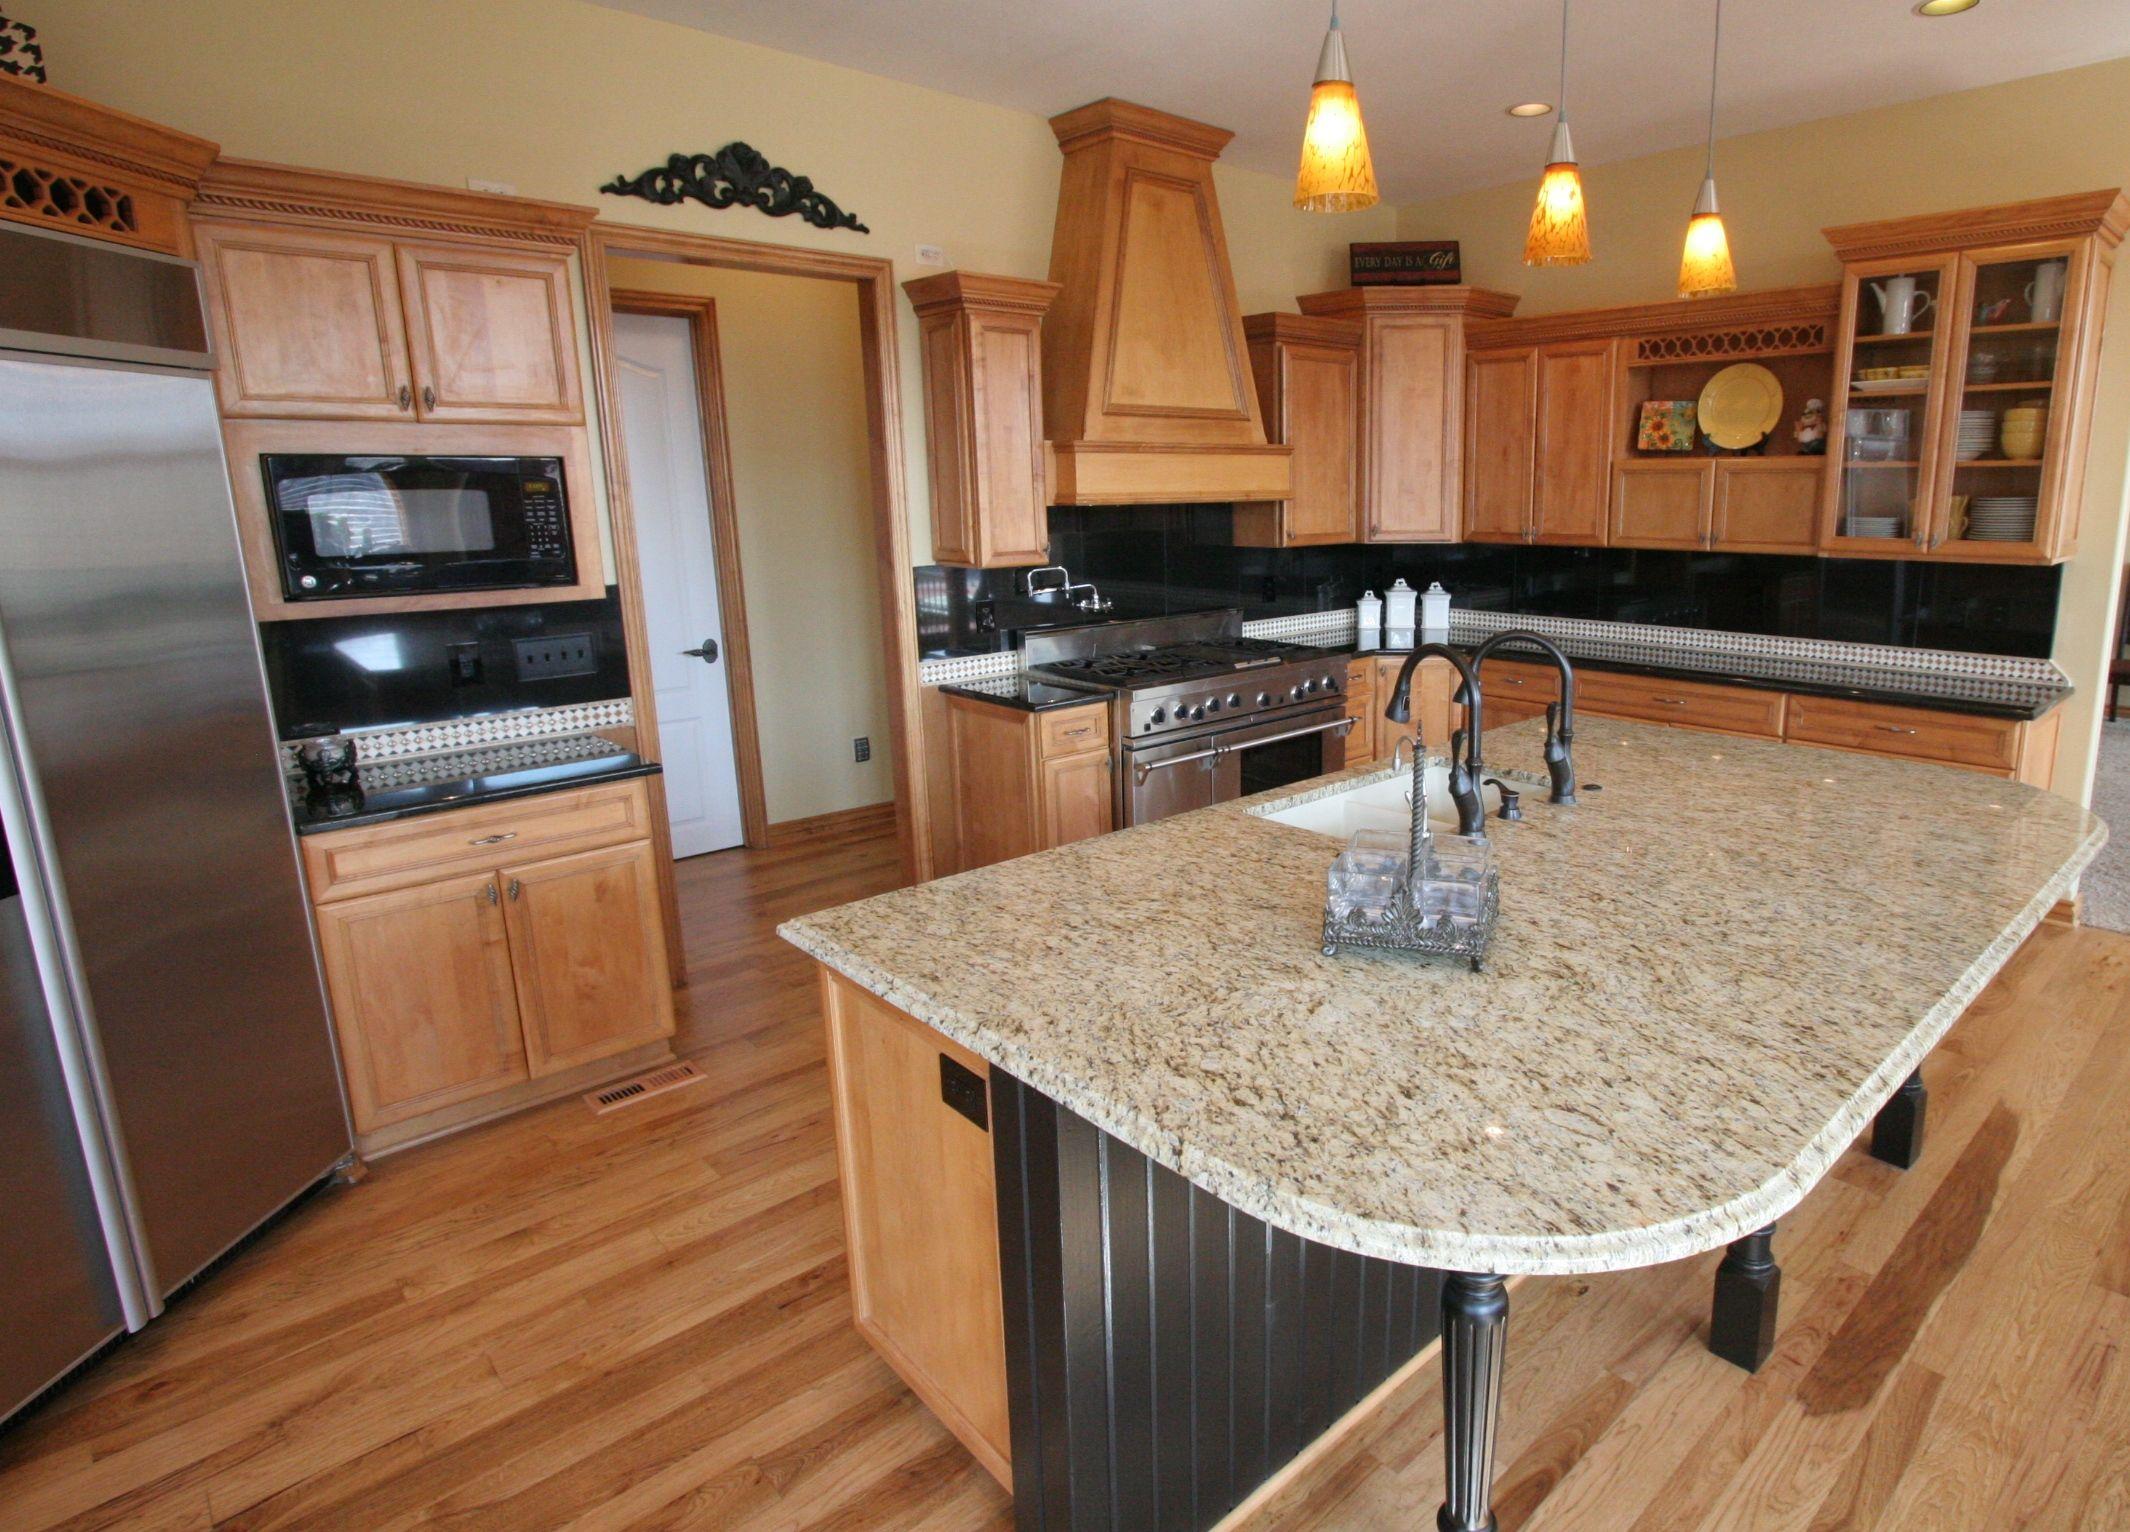 Tune Up Modify Island To One Level Granite Backsplash Kitchen Tune Up Wichita Ks 316 558 8888 4057 N Woodlawn 1 Kitchen Kitchen Cabinets Woodlawn